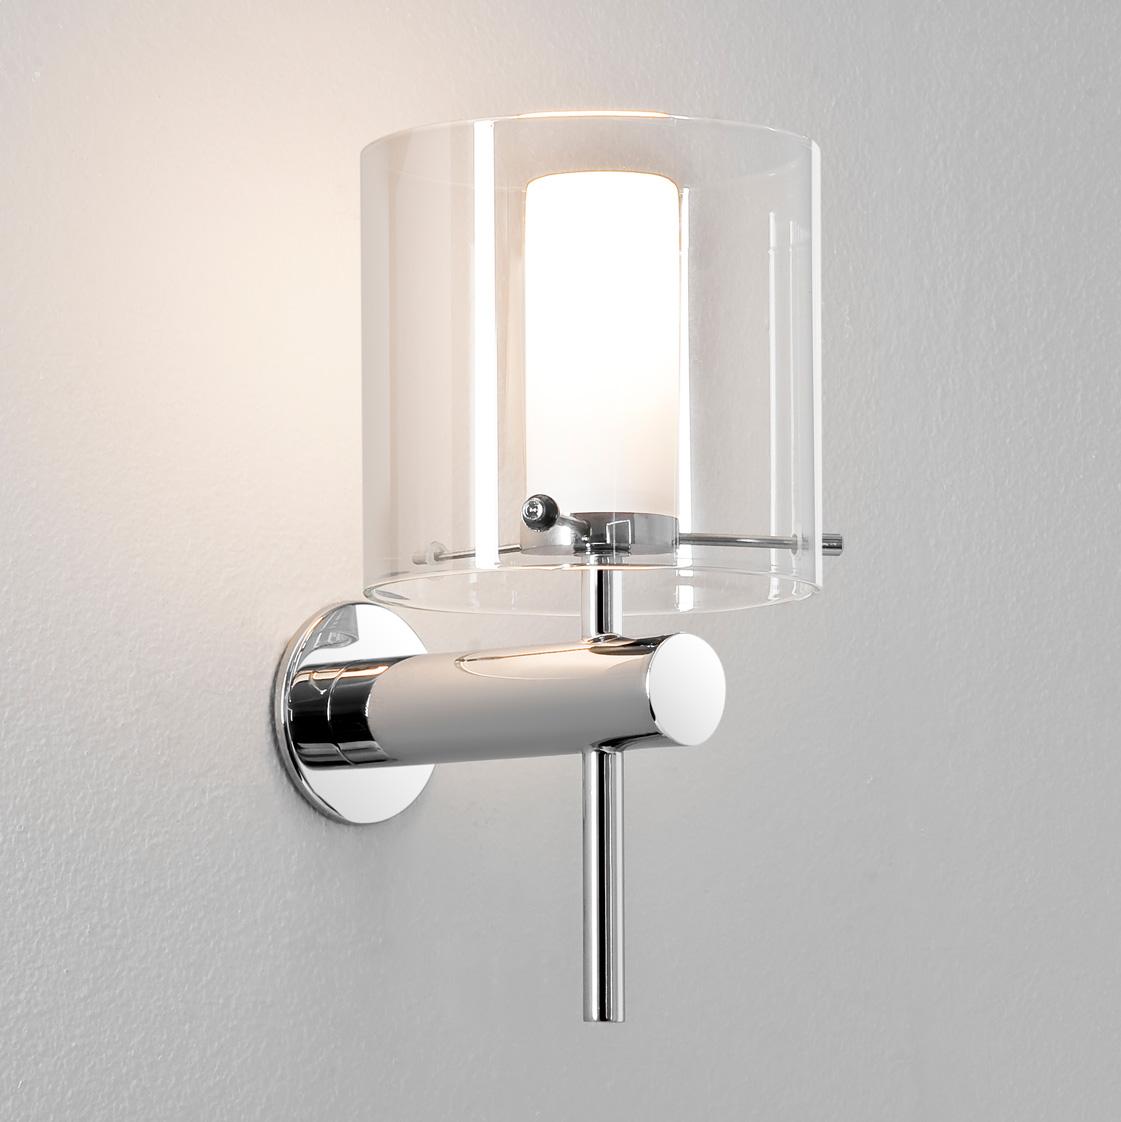 Bathroom Wall Lamp Shades : ASTRO Arrezzo 0342 Bathroom wall light 1x28W G9 lamp IP44 Chrome Glass shade eBay